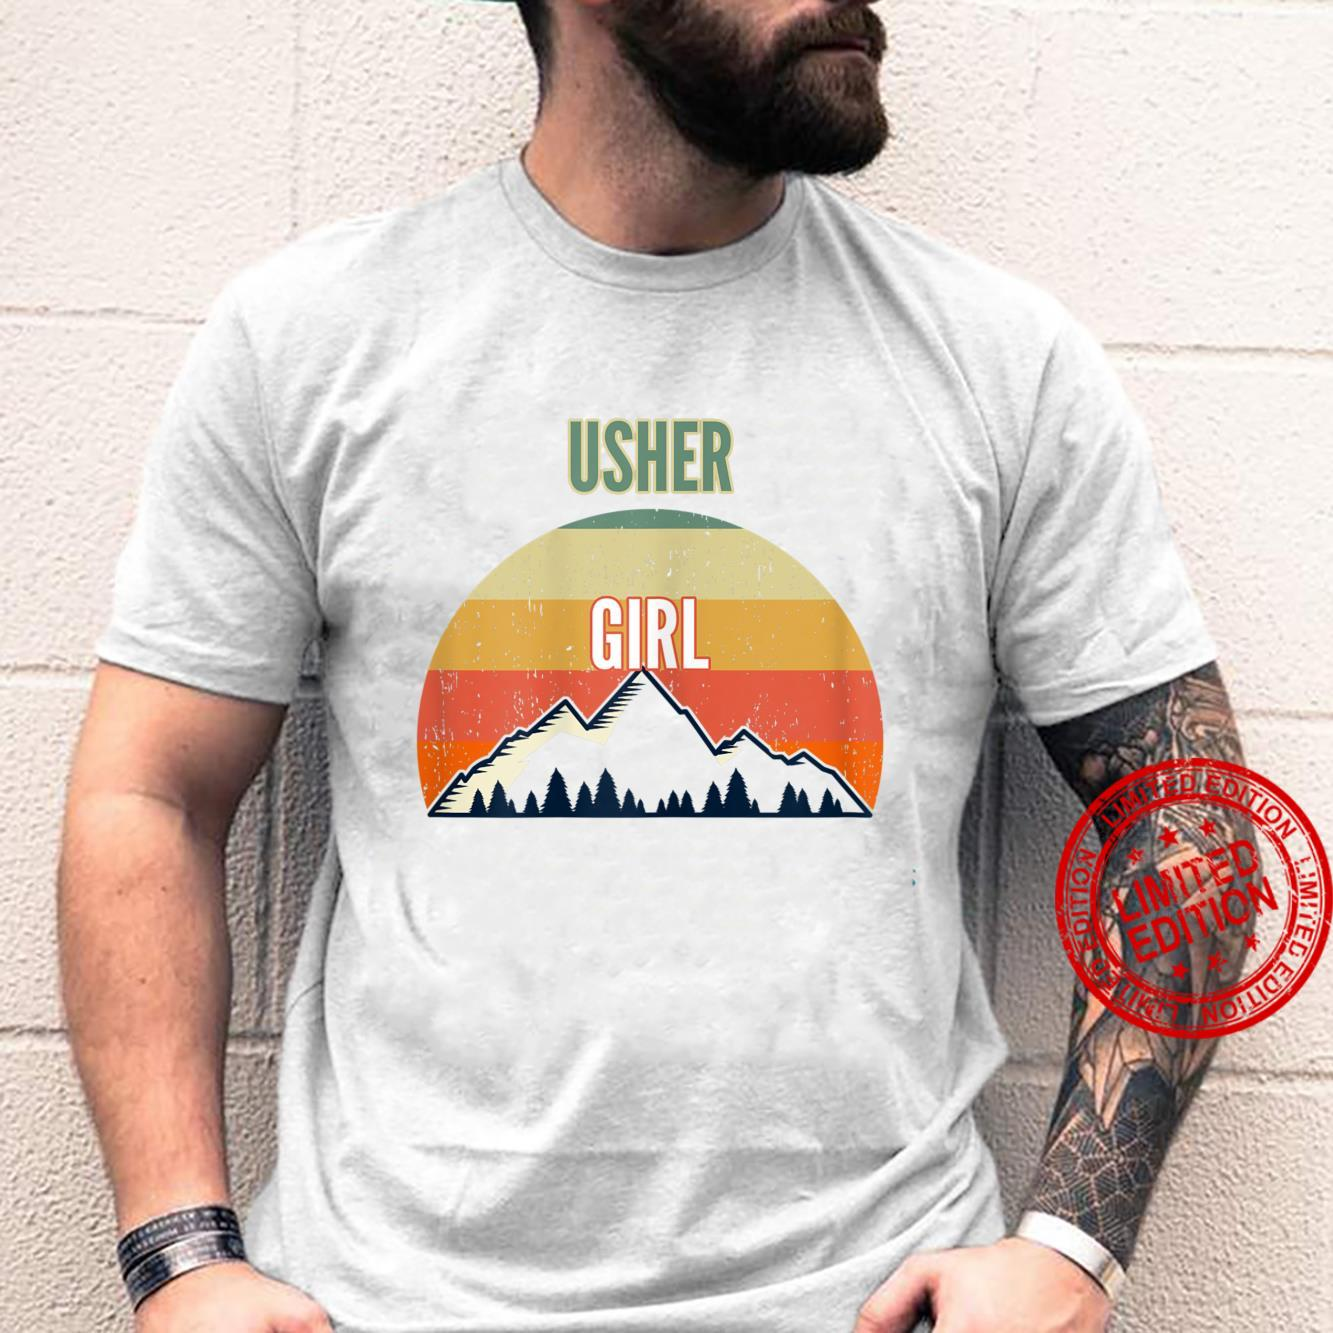 Usher, Usher Guy Shirt